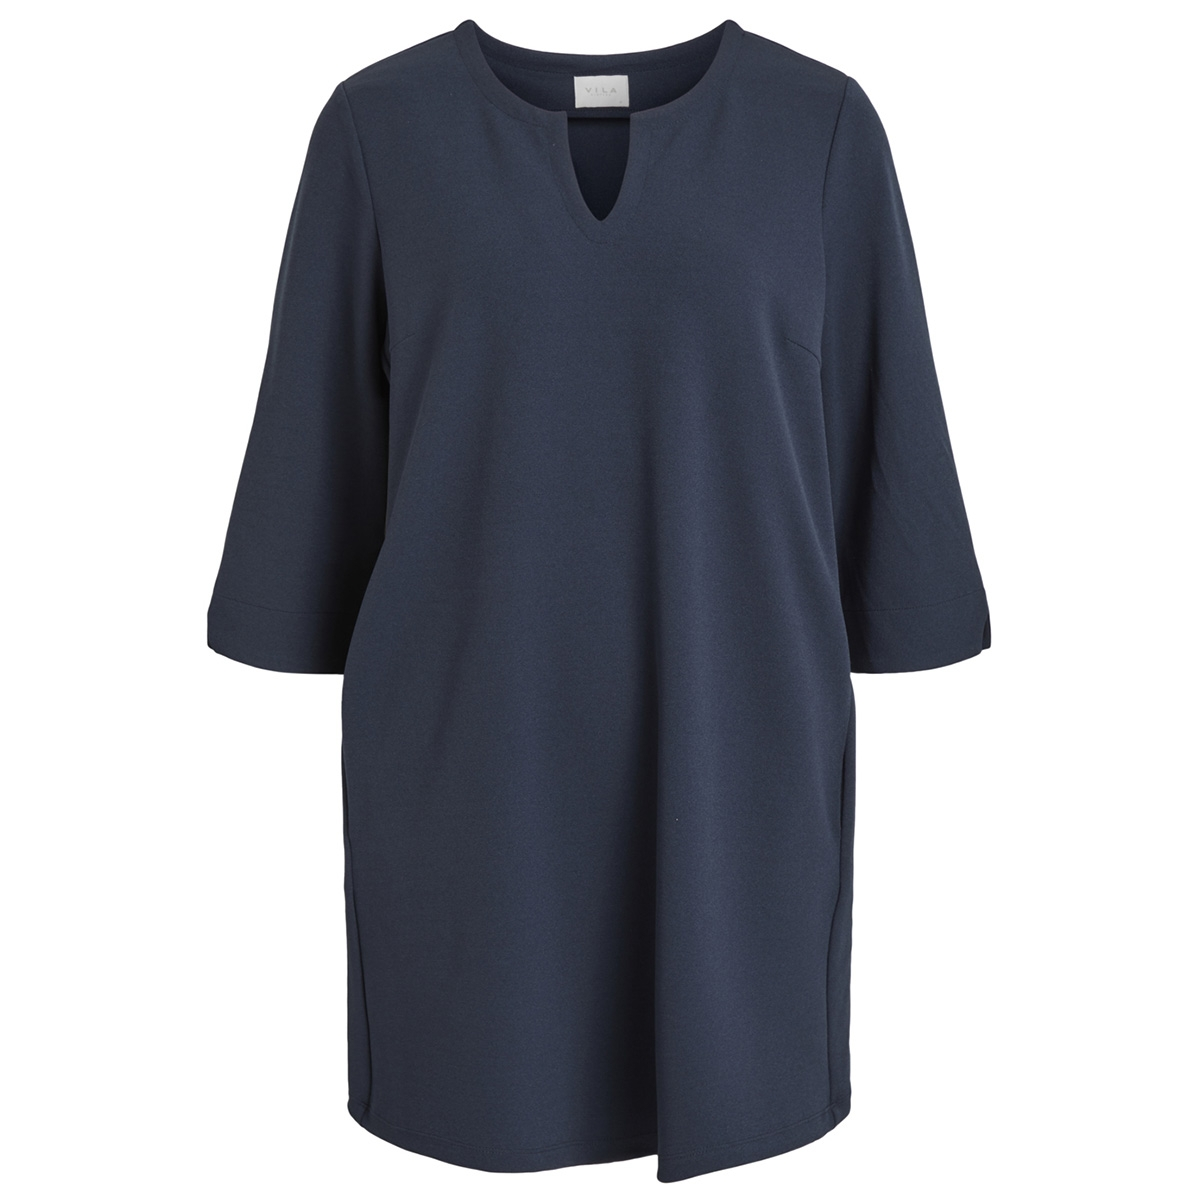 visalli 3/4 sleeve dress/1 14052836 vila jurk total eclipse